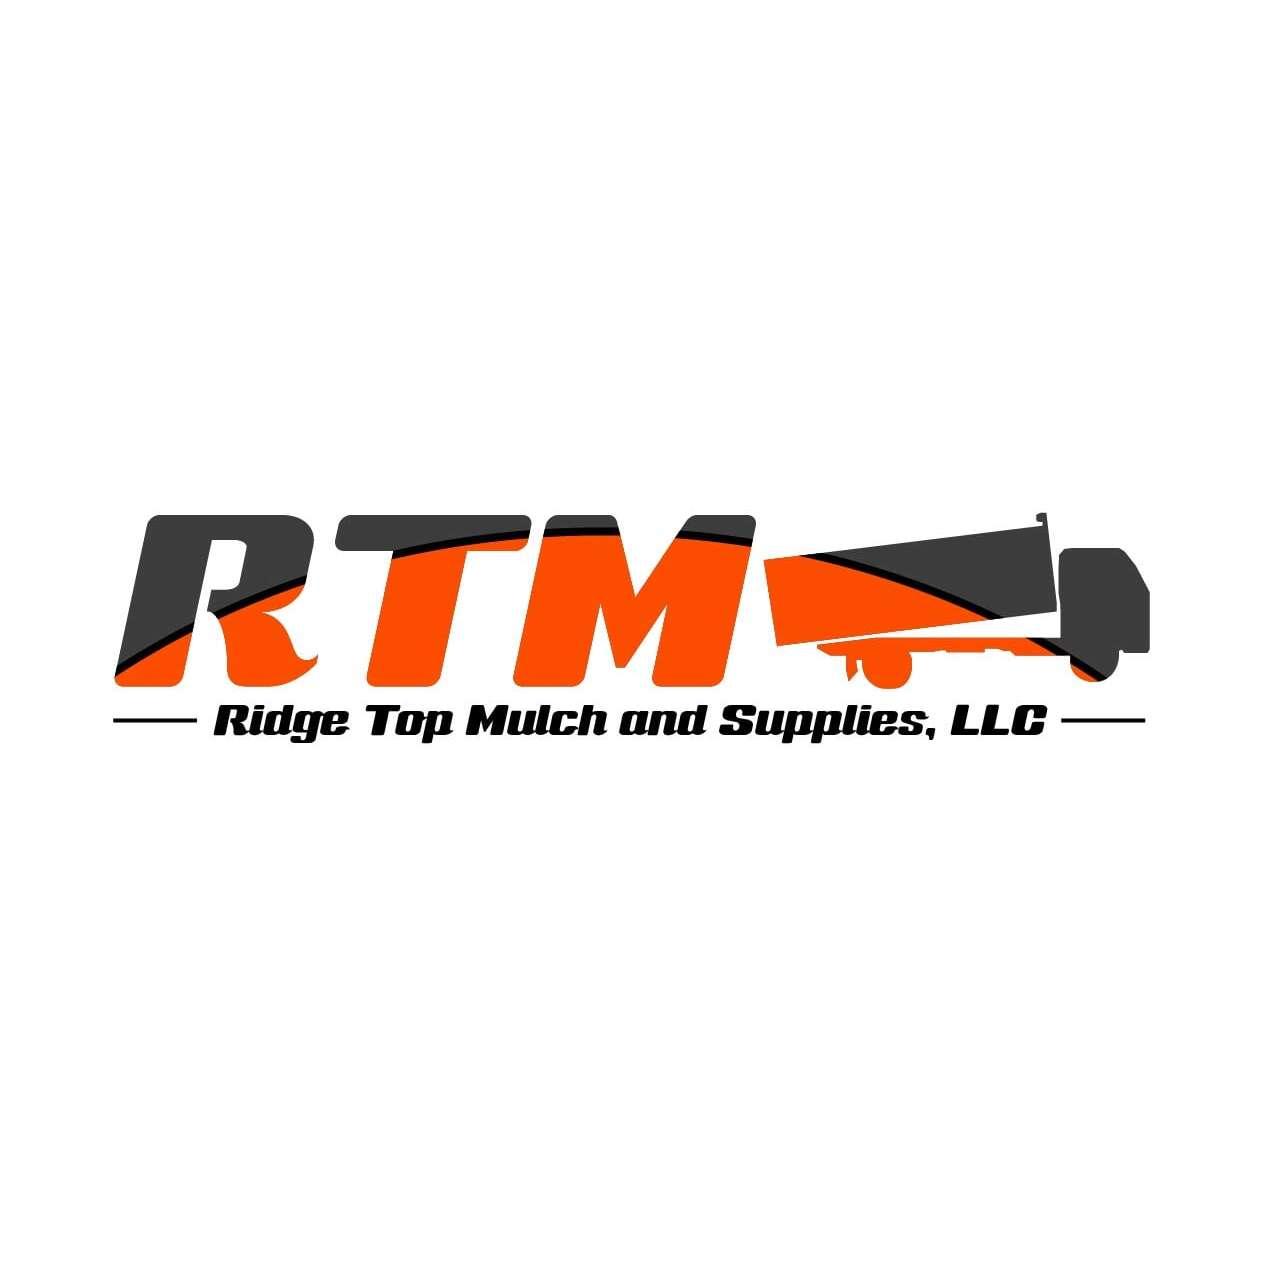 Ridge Top Mulch and Supplies LLC image 0